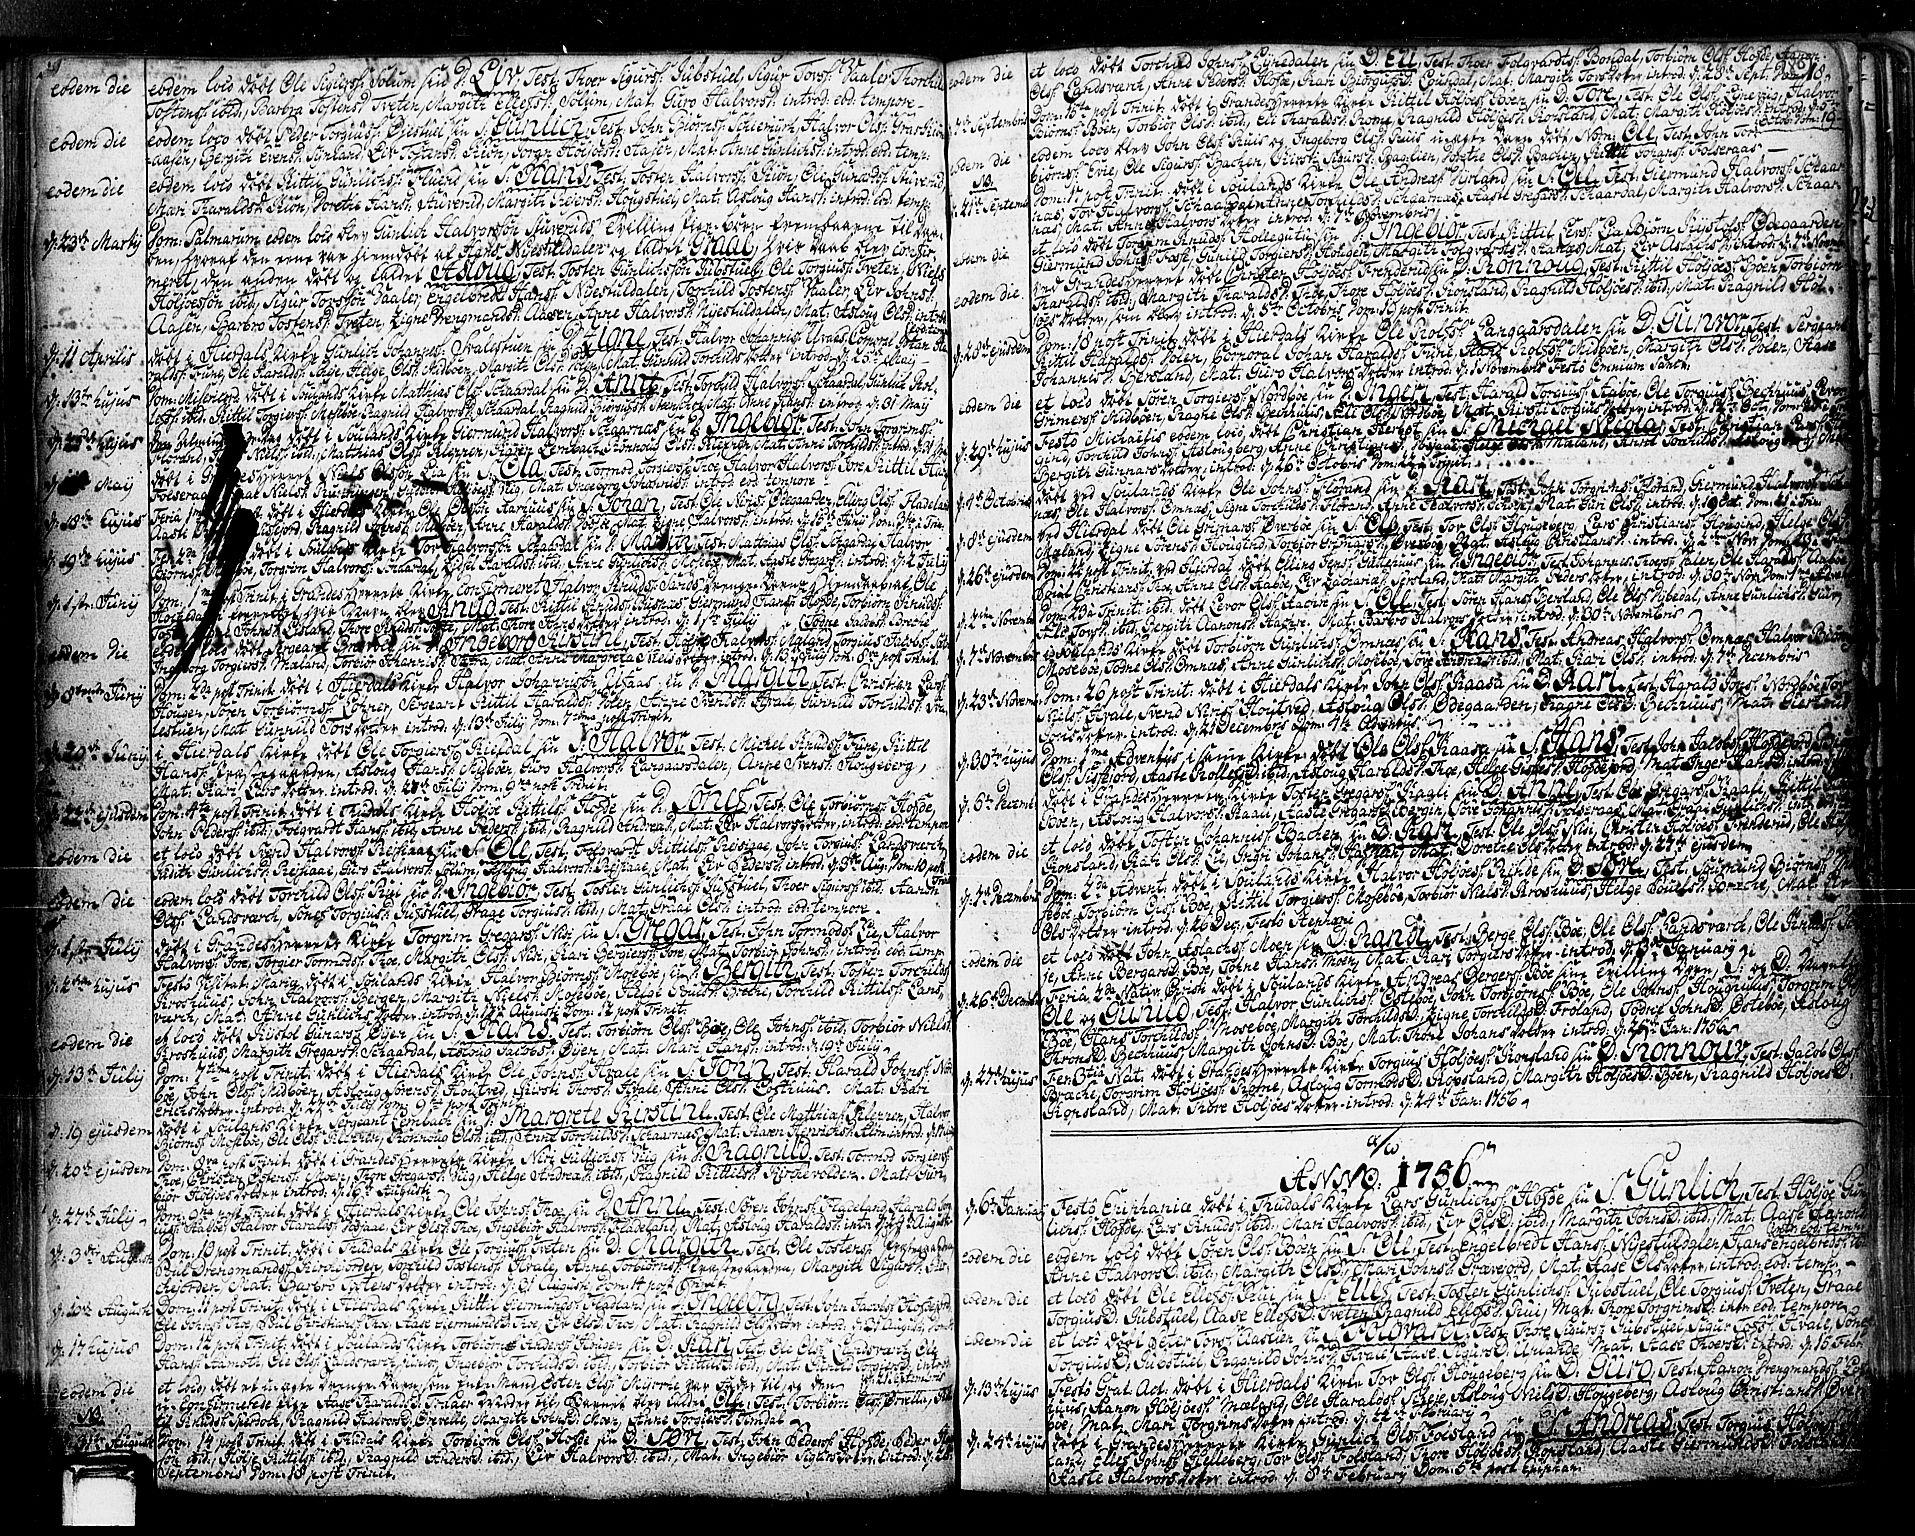 SAKO, Hjartdal kirkebøker, F/Fa/L0003: Ministerialbok nr. I 3, 1727-1775, s. 80